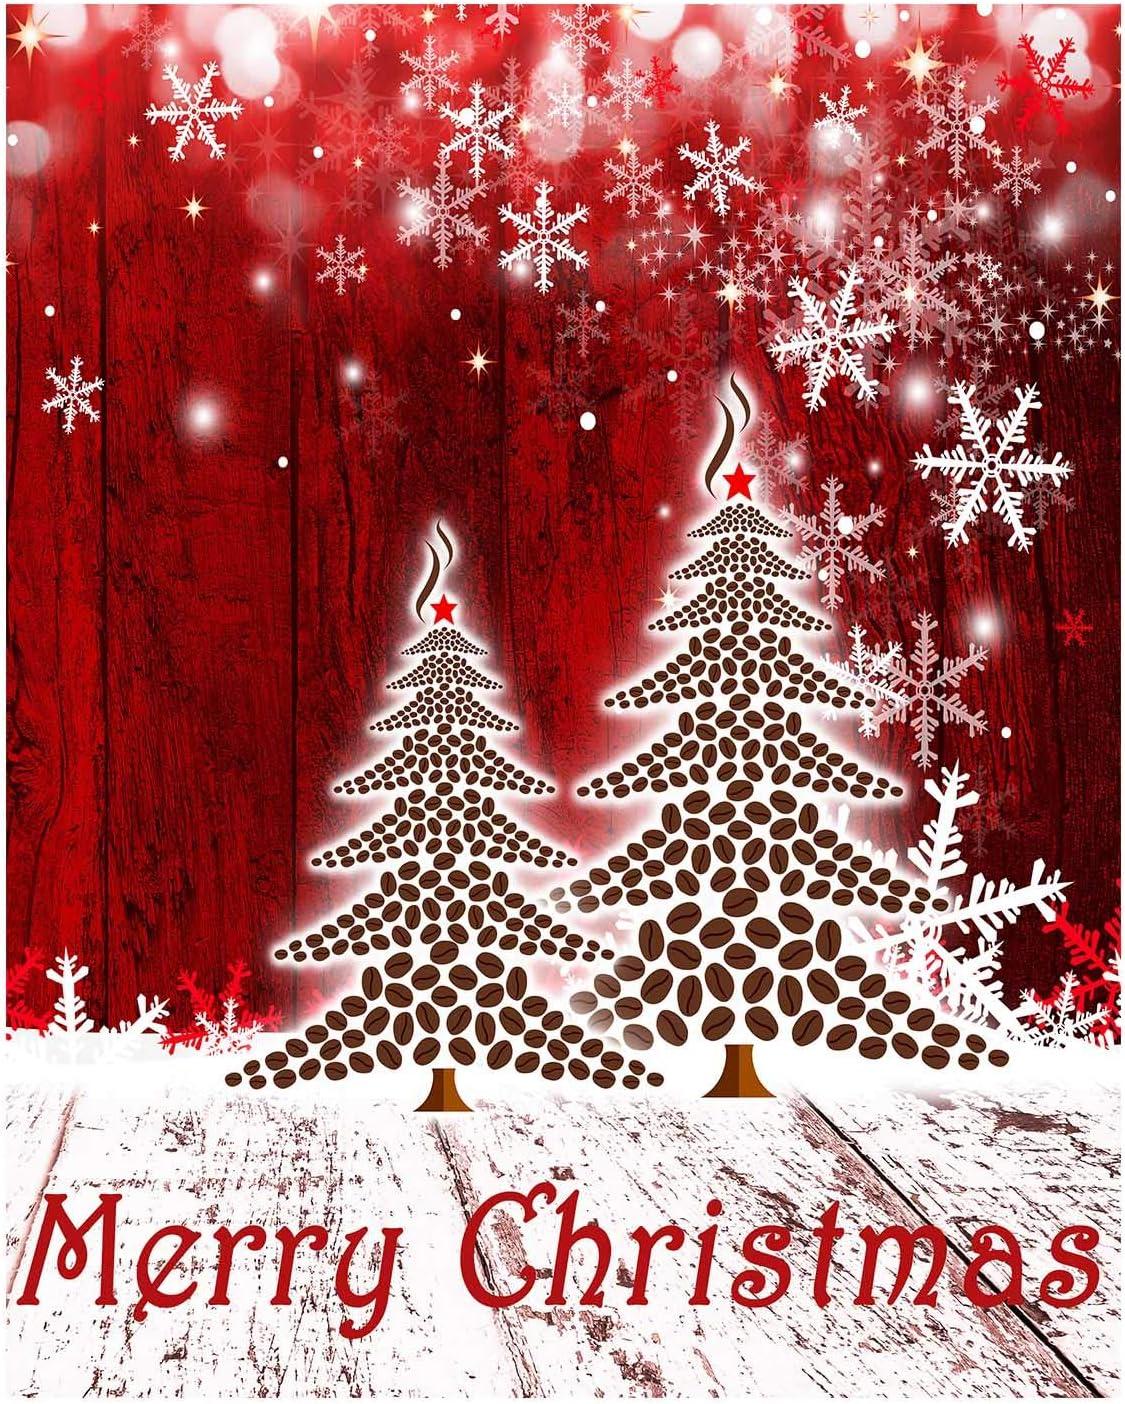 Merry Christmas Tree Snowflake Garden Flag Si Double Fashionable Snow Popular Winter